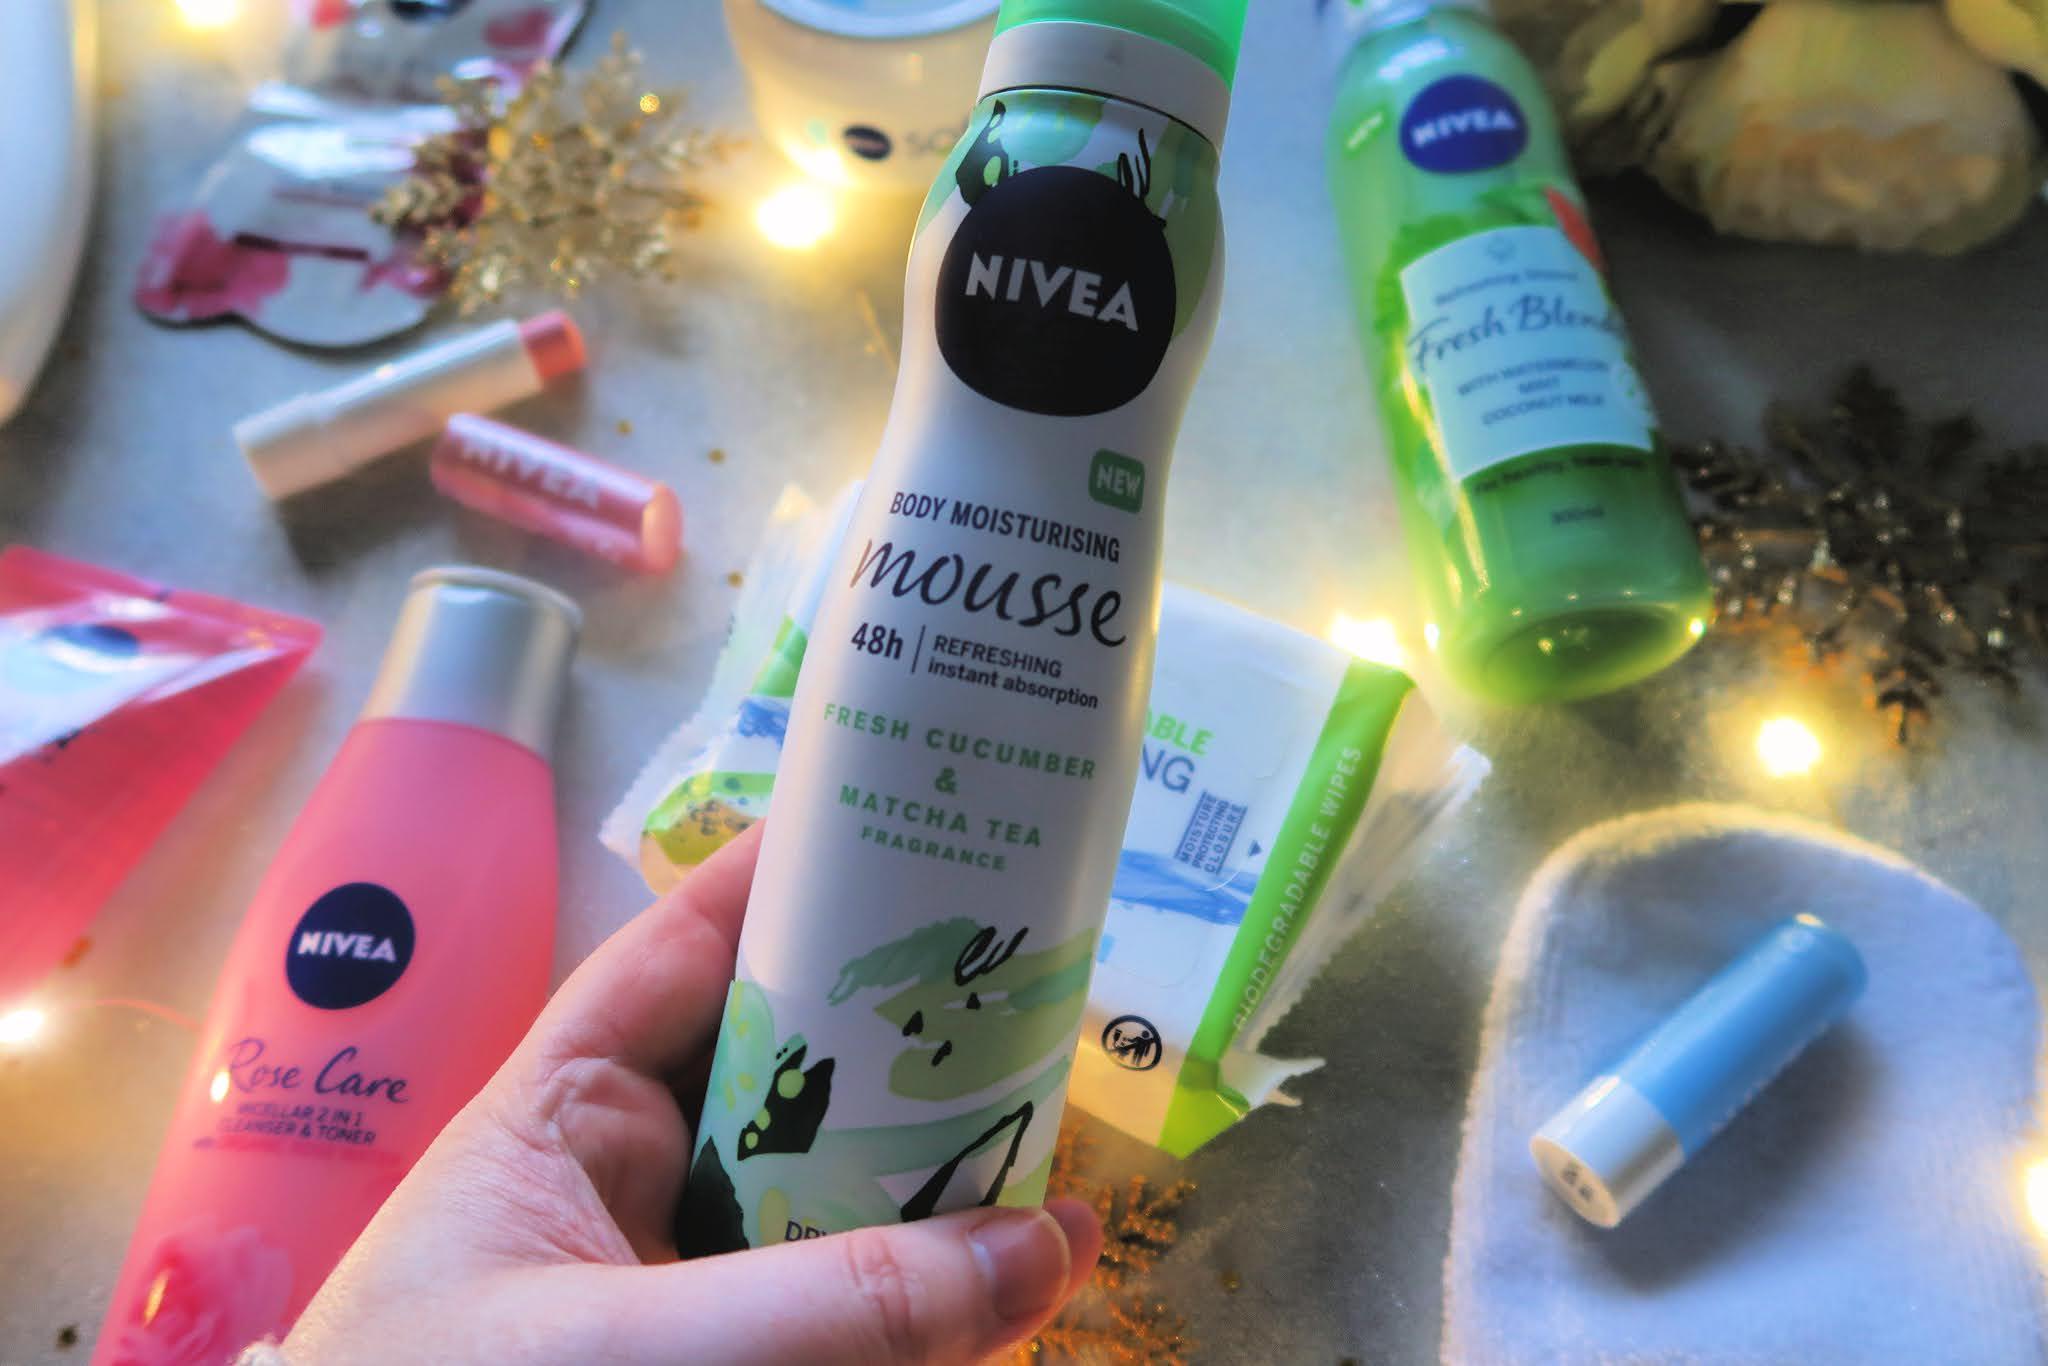 Danielle Levy, Christmas Gift Guide, ARK Skincare, Dermalogica, LilSpa, NIVEA, beauty blogger, lifestyle blogger, Wirral blogger, Liverpool blogger,